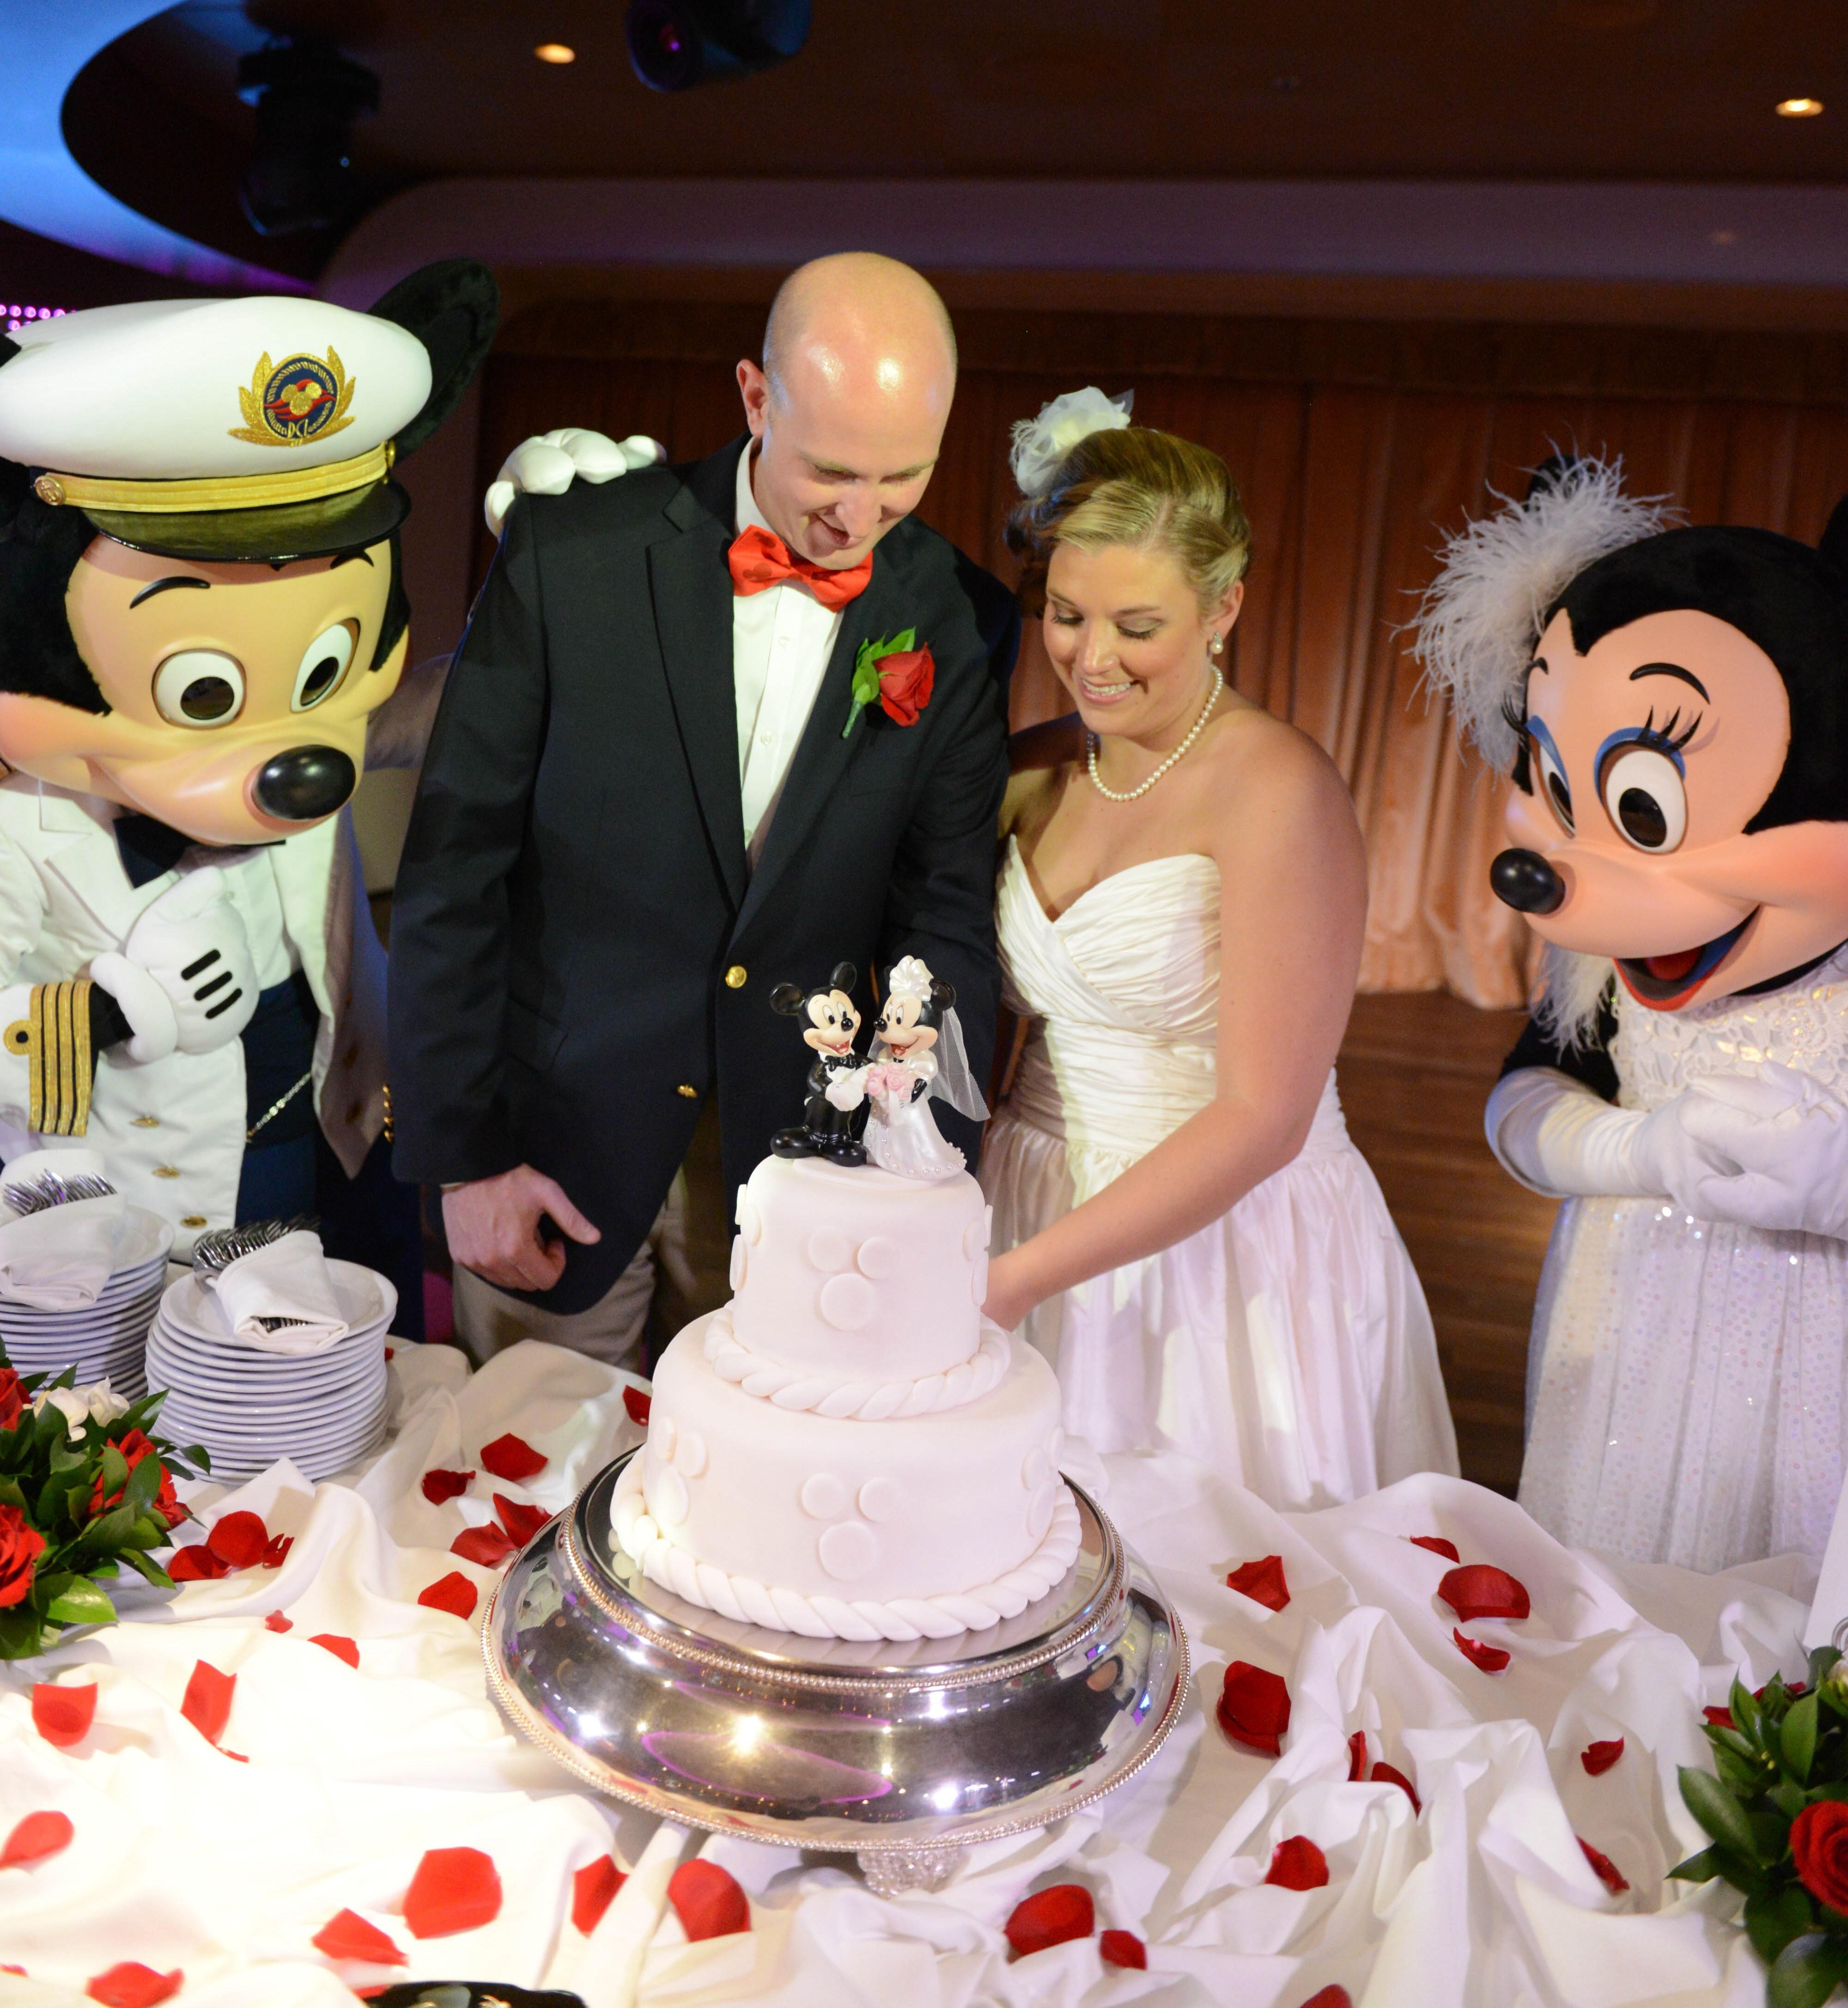 Disney Cruise Wedding.Disney Cruise Wedding Details